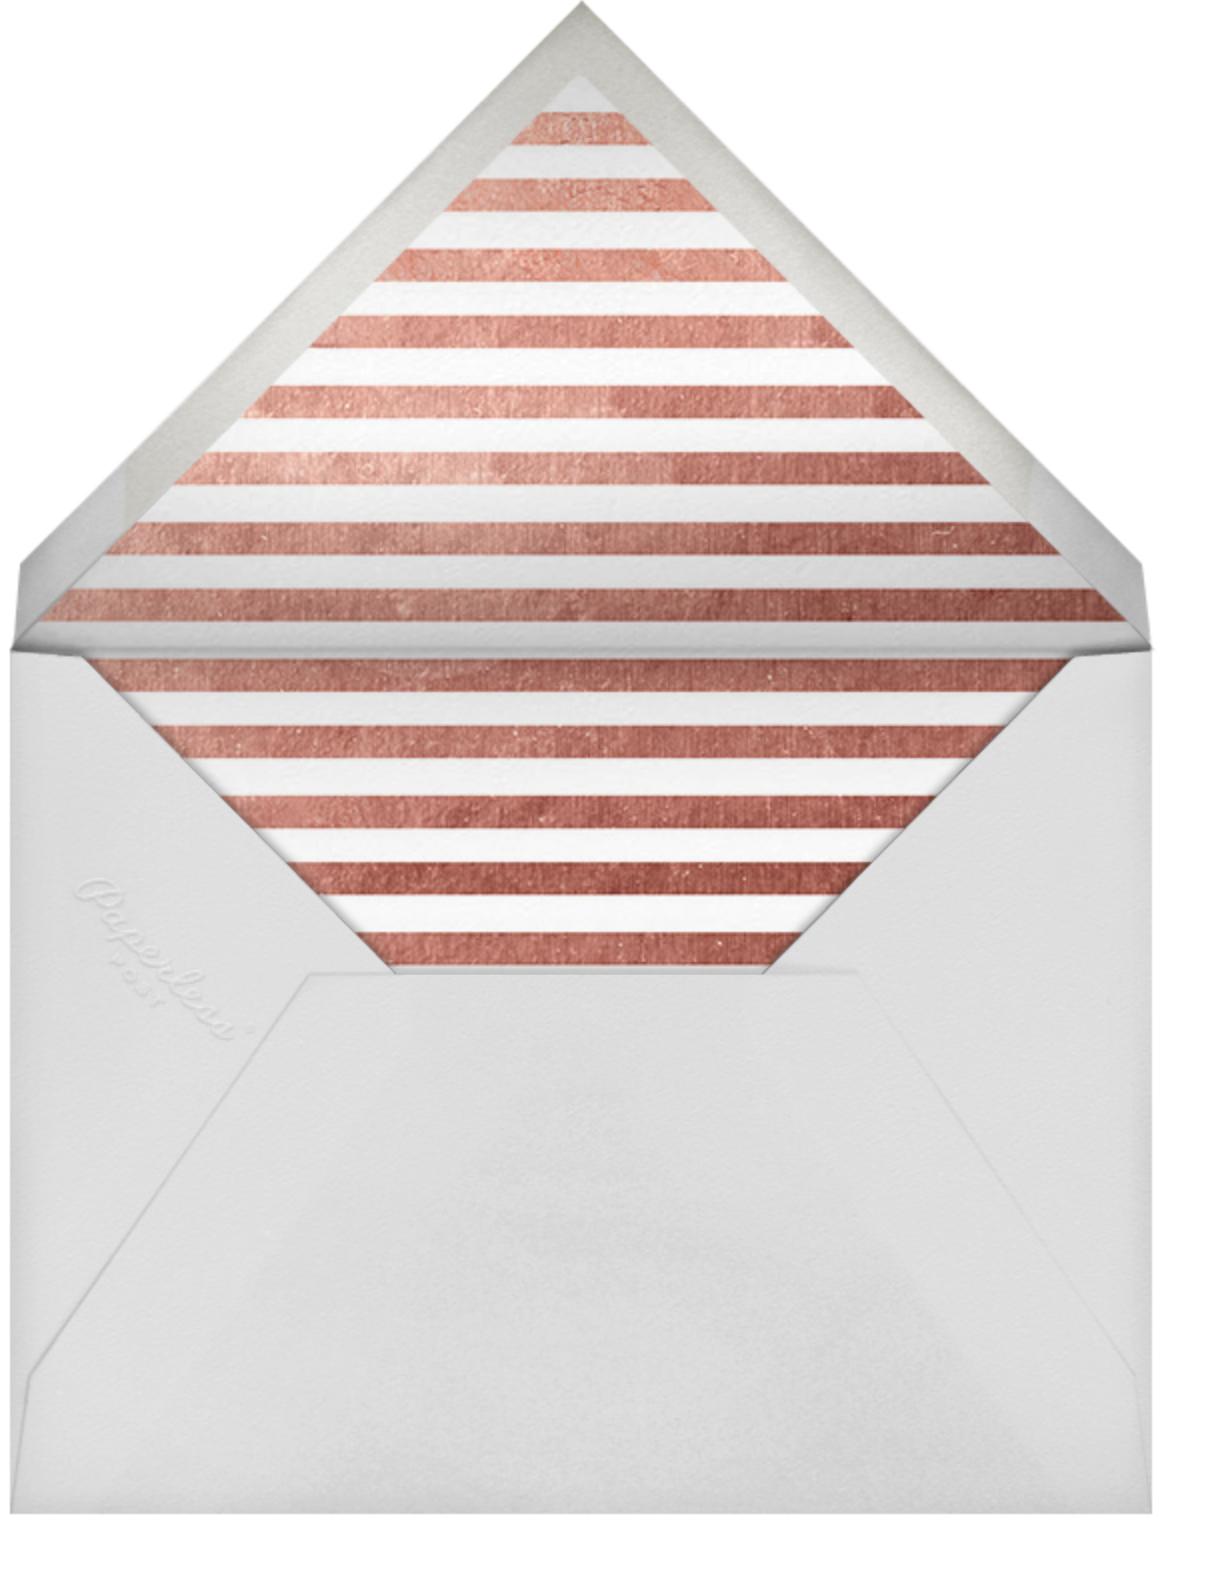 Classic Vintage - Rose Gold/Pink - kate spade new york - Adult birthday - envelope back